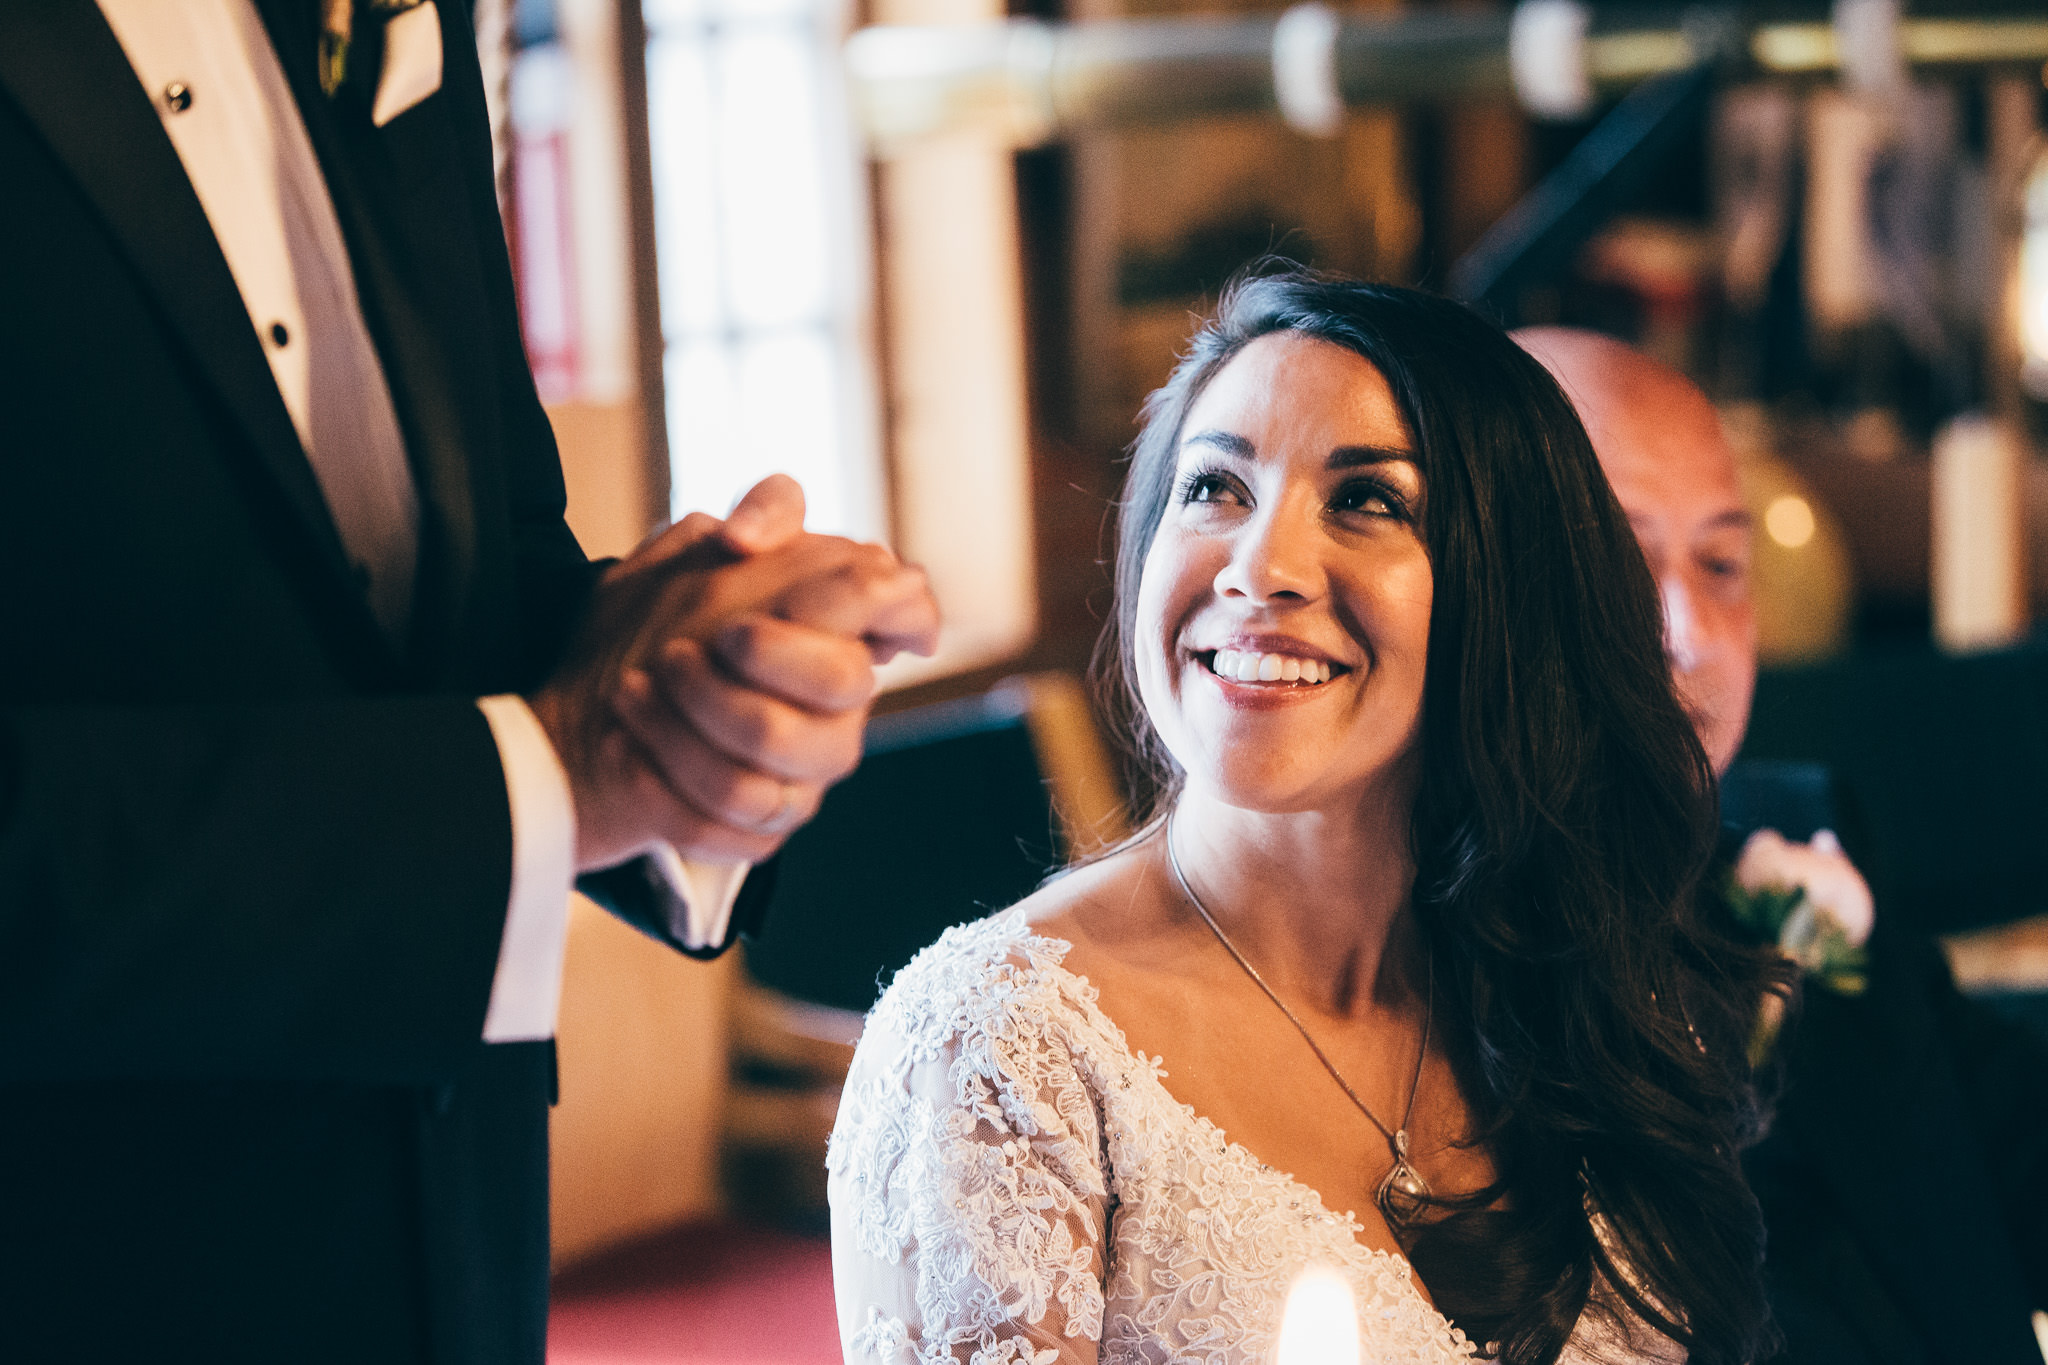 Wedding+Photographer+Norway+Bryllupsfotograf+Casey+Arneson+MK-181.jpg